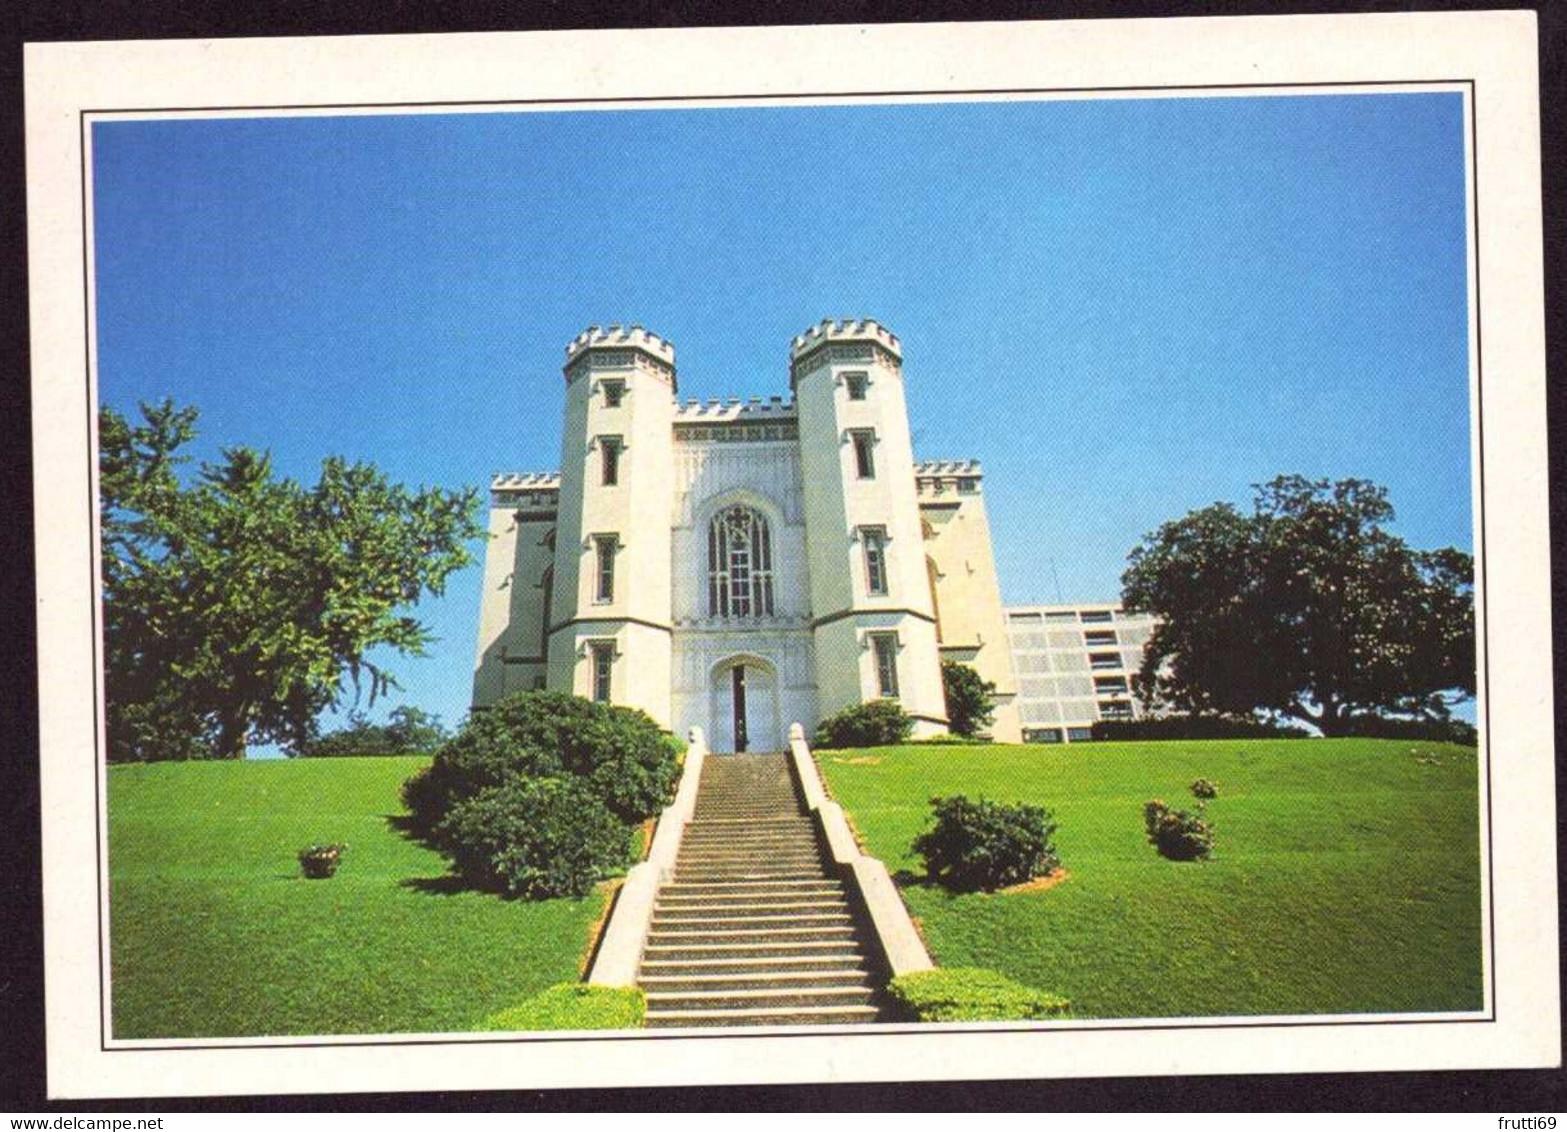 AK 005047 USA - Louisiana - Burgschloß Von Baton Rouge - Baton Rouge